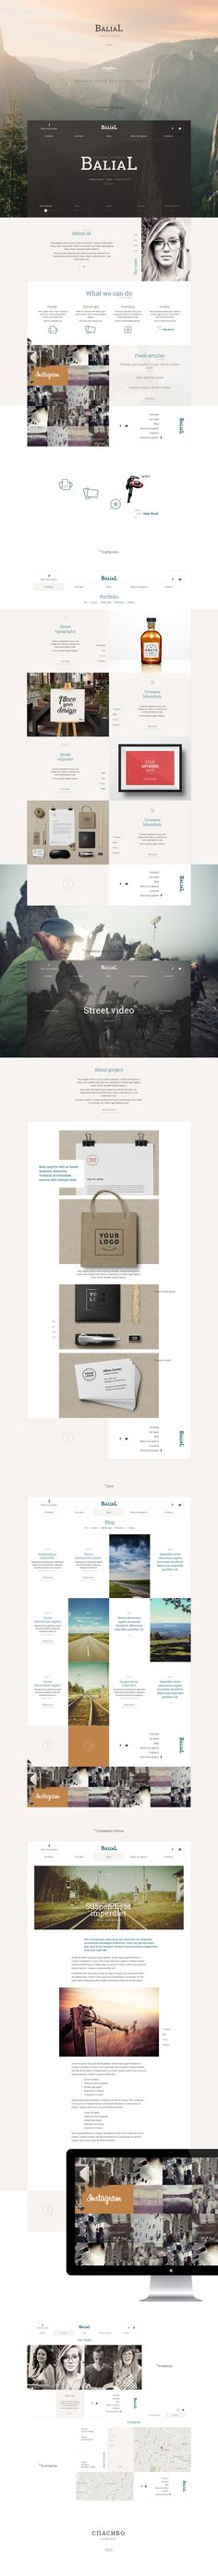 Балиал Сайт © Николай Скоробогатько #website #webdesign #studio #portfolio #blog #template